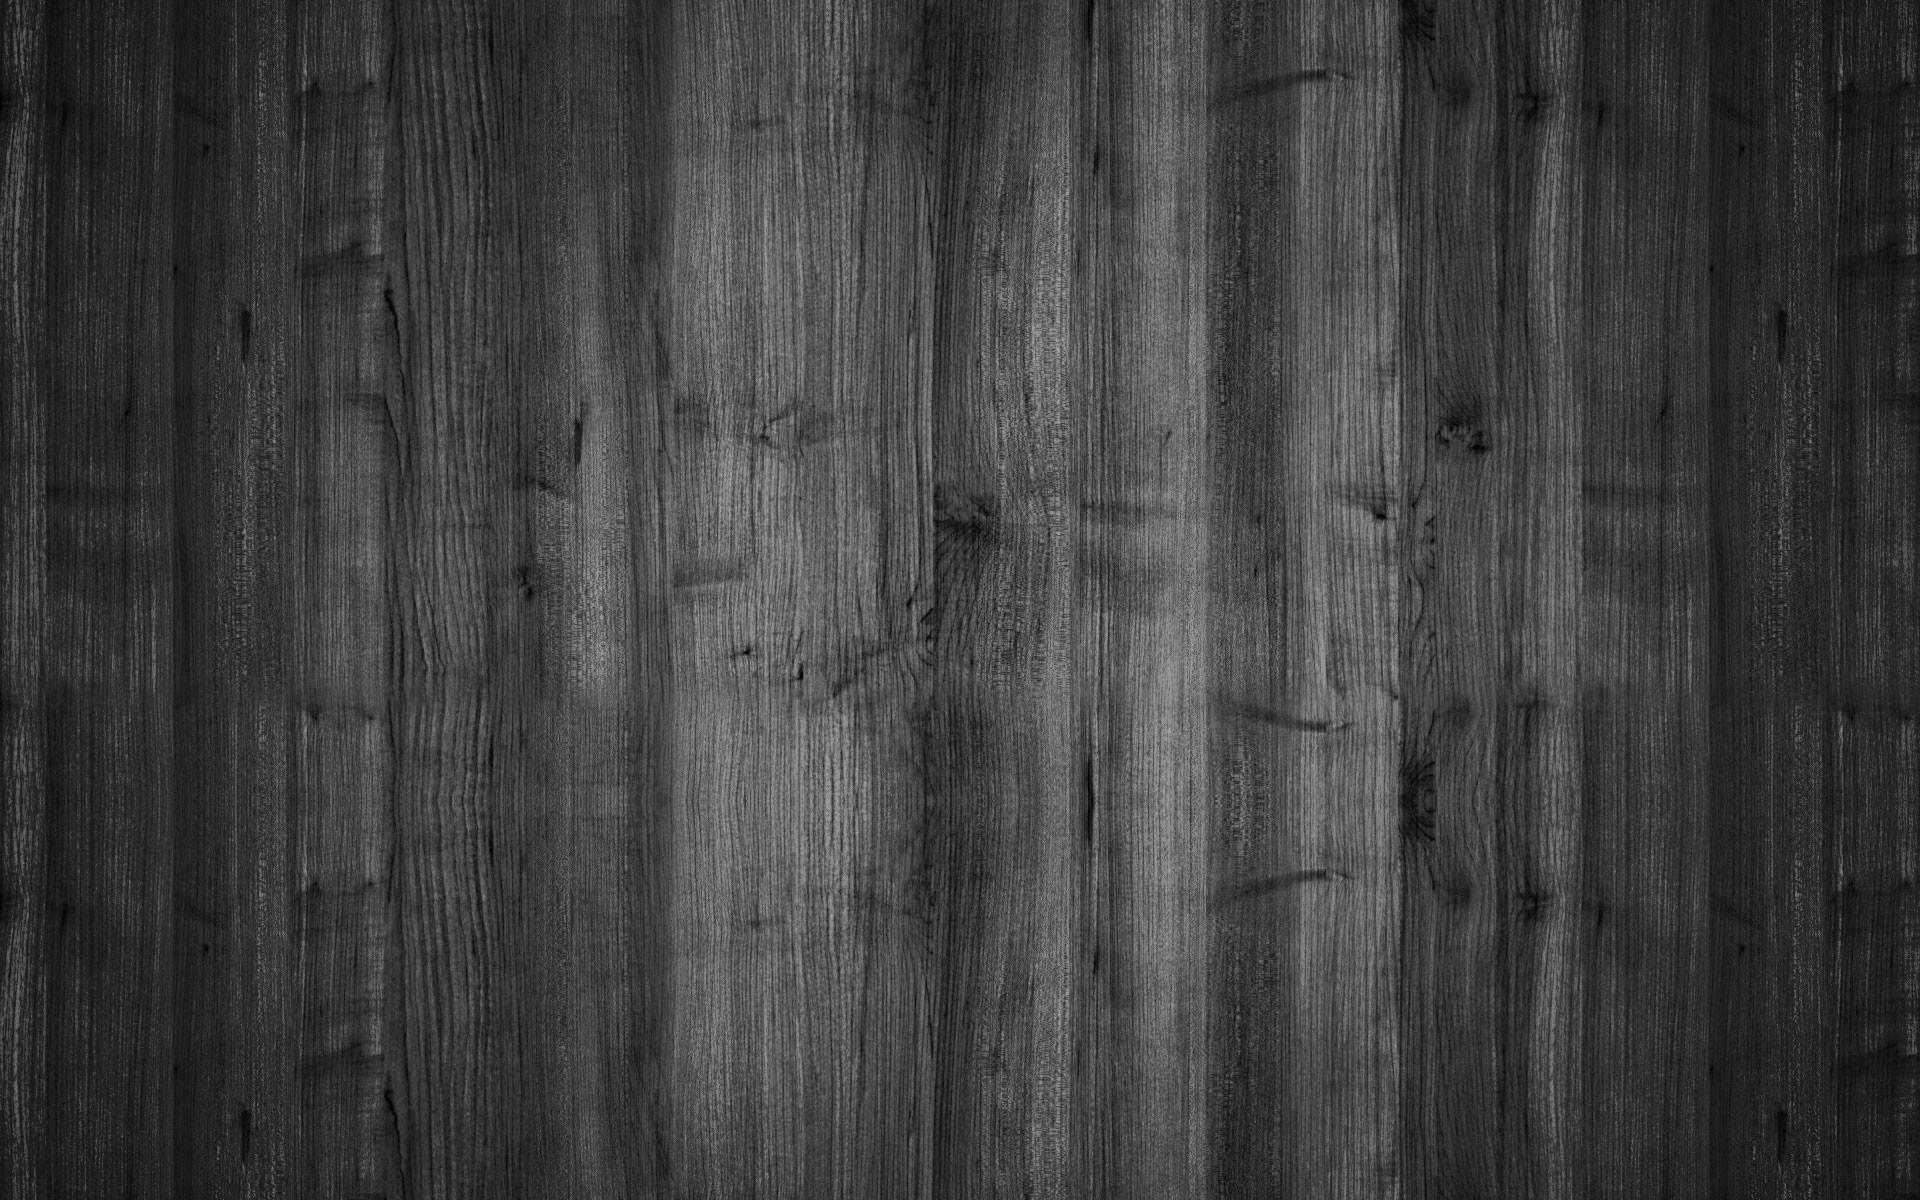 barnwood wallpaper by brewster wallpaper. weathered barn wood …